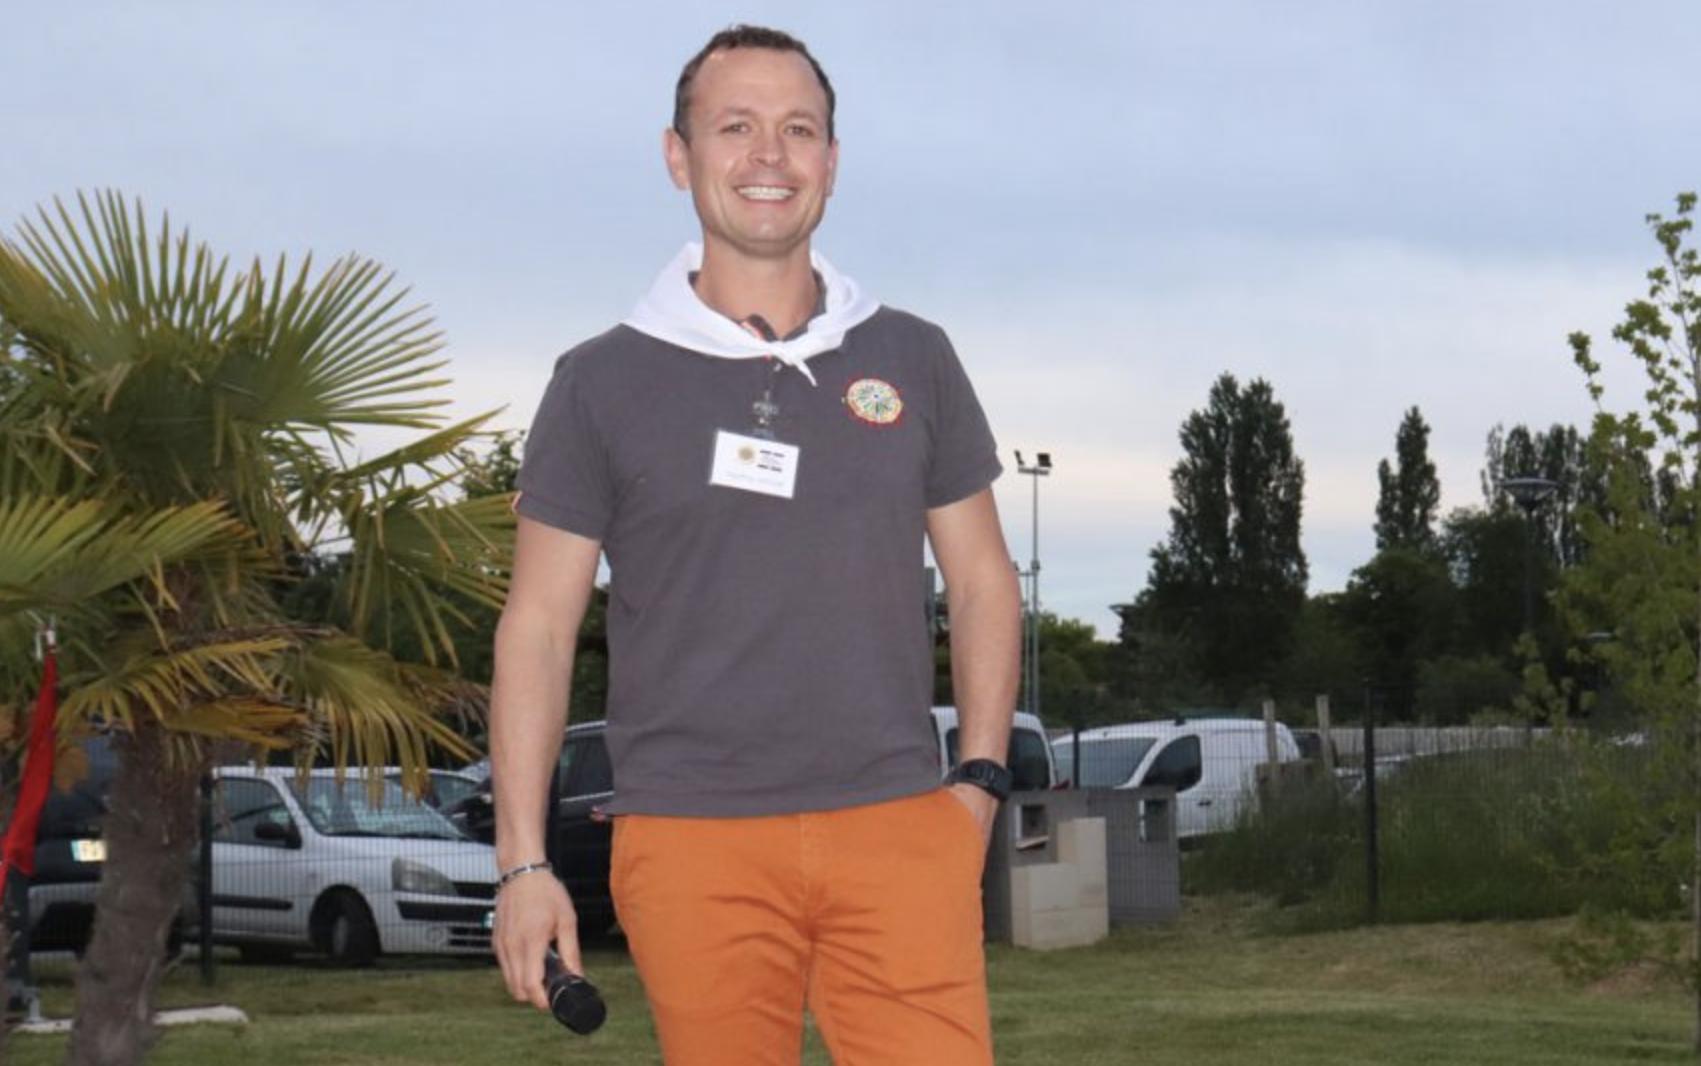 Paroles de partenaires : Geoffroy Latour s'y colle